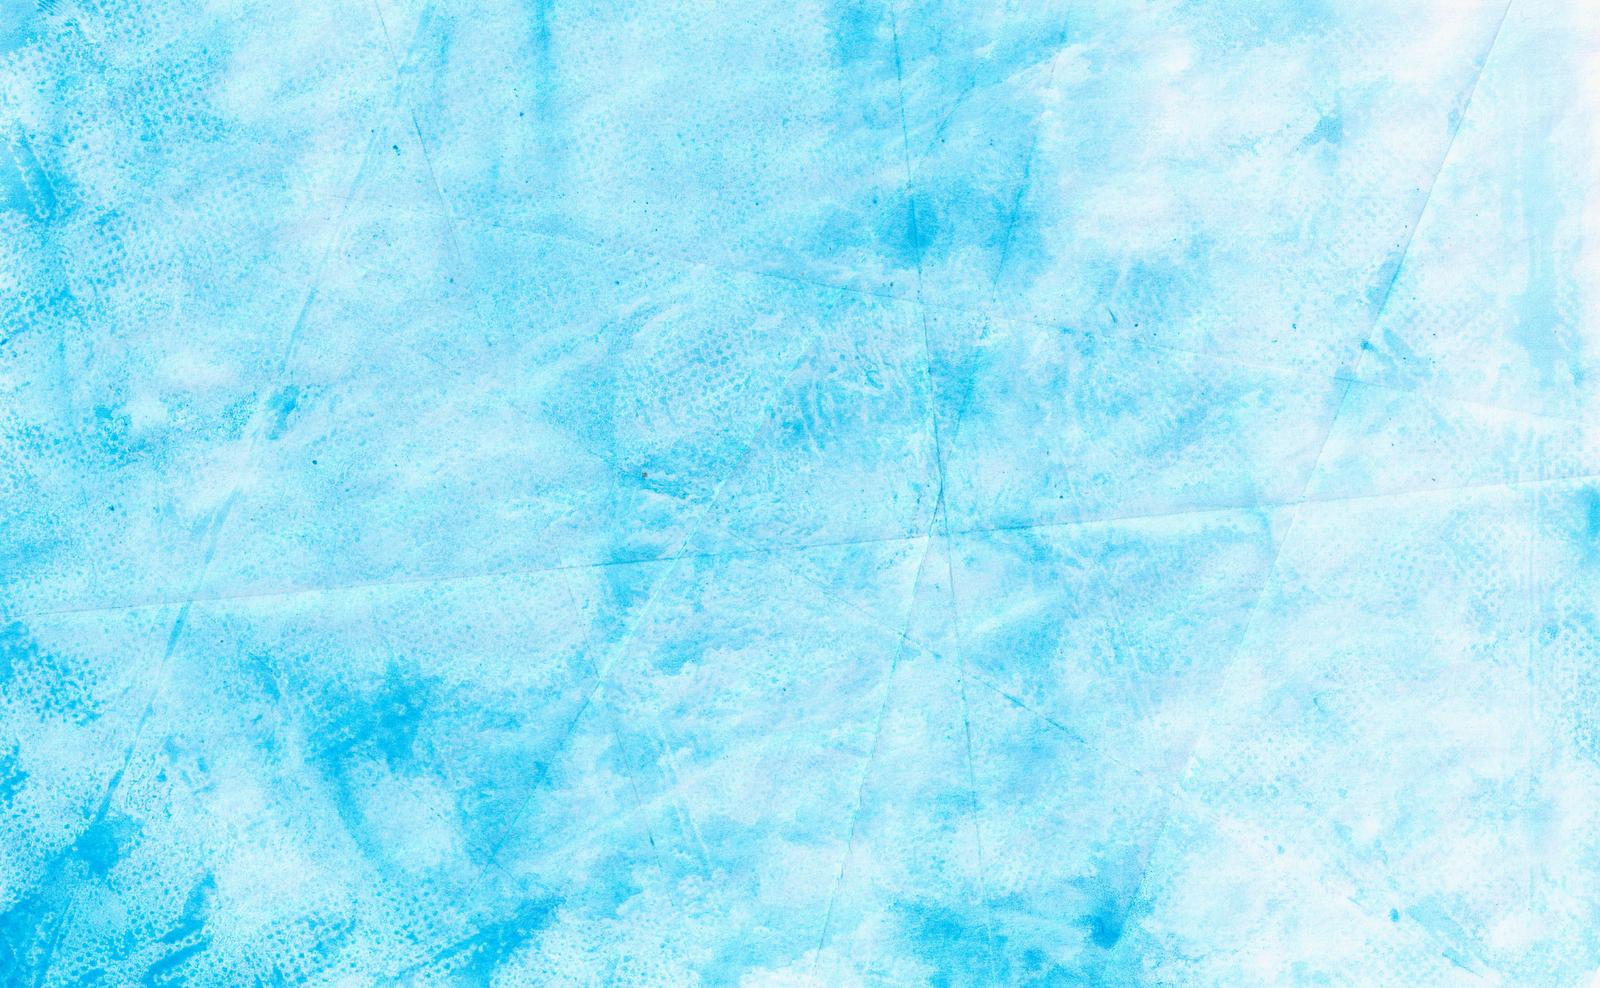 Blue Ice Paint